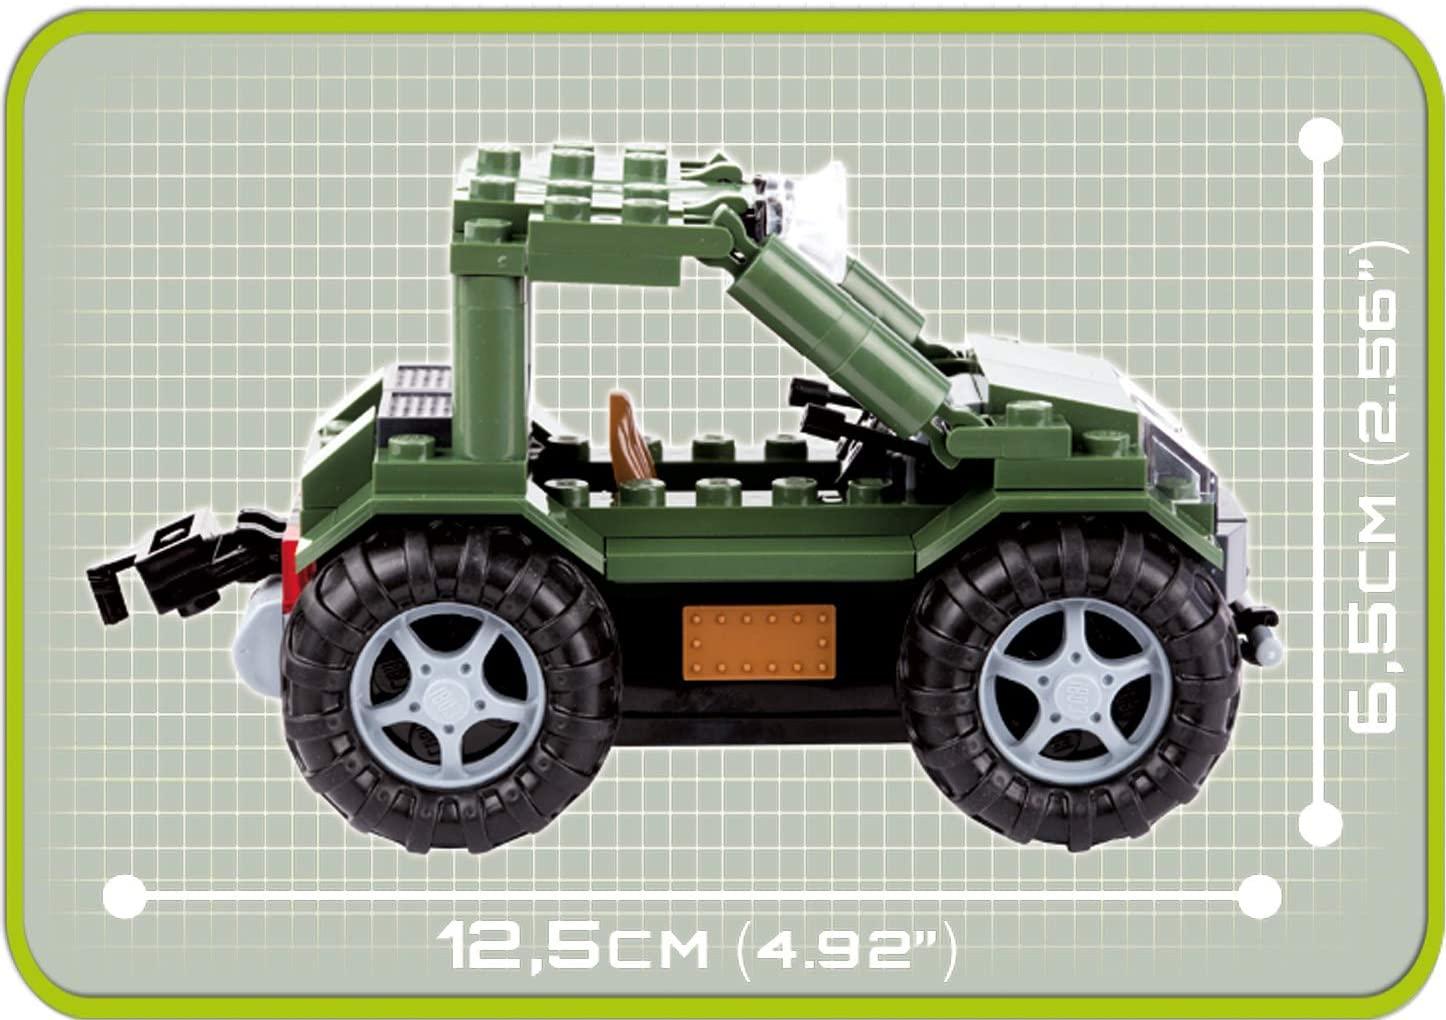 COBI - Buggy Patrulha De Fronteira Com 150 Pcs